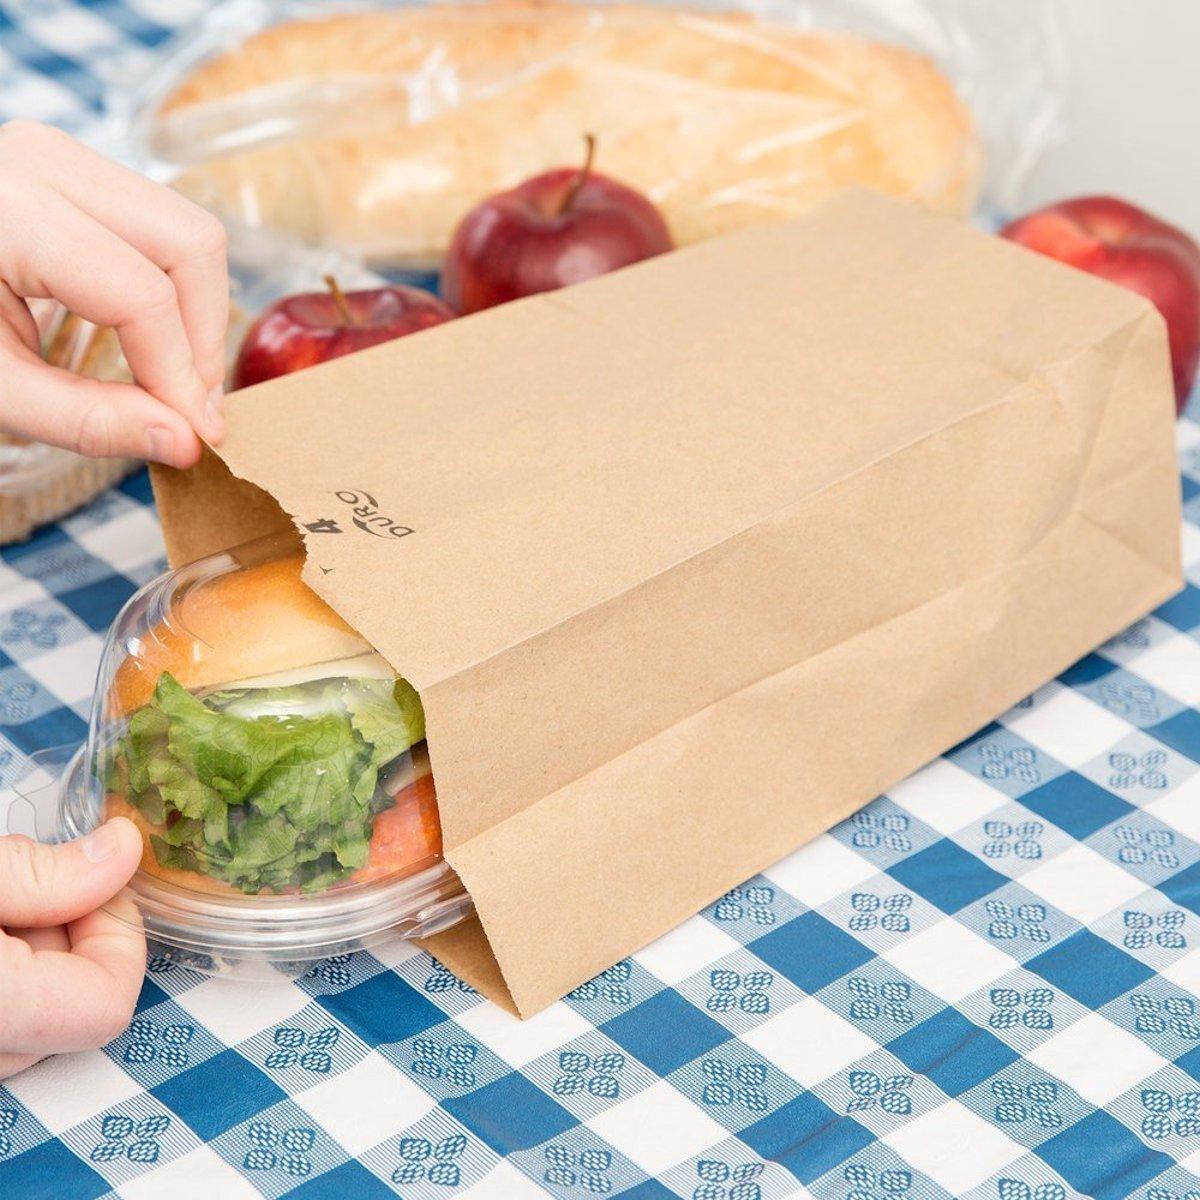 Paper Lunch Bags, Paper Grocery Bags, Durable Kraft Paper Bags, Pack Of 500 Bags (6lb, Brown)